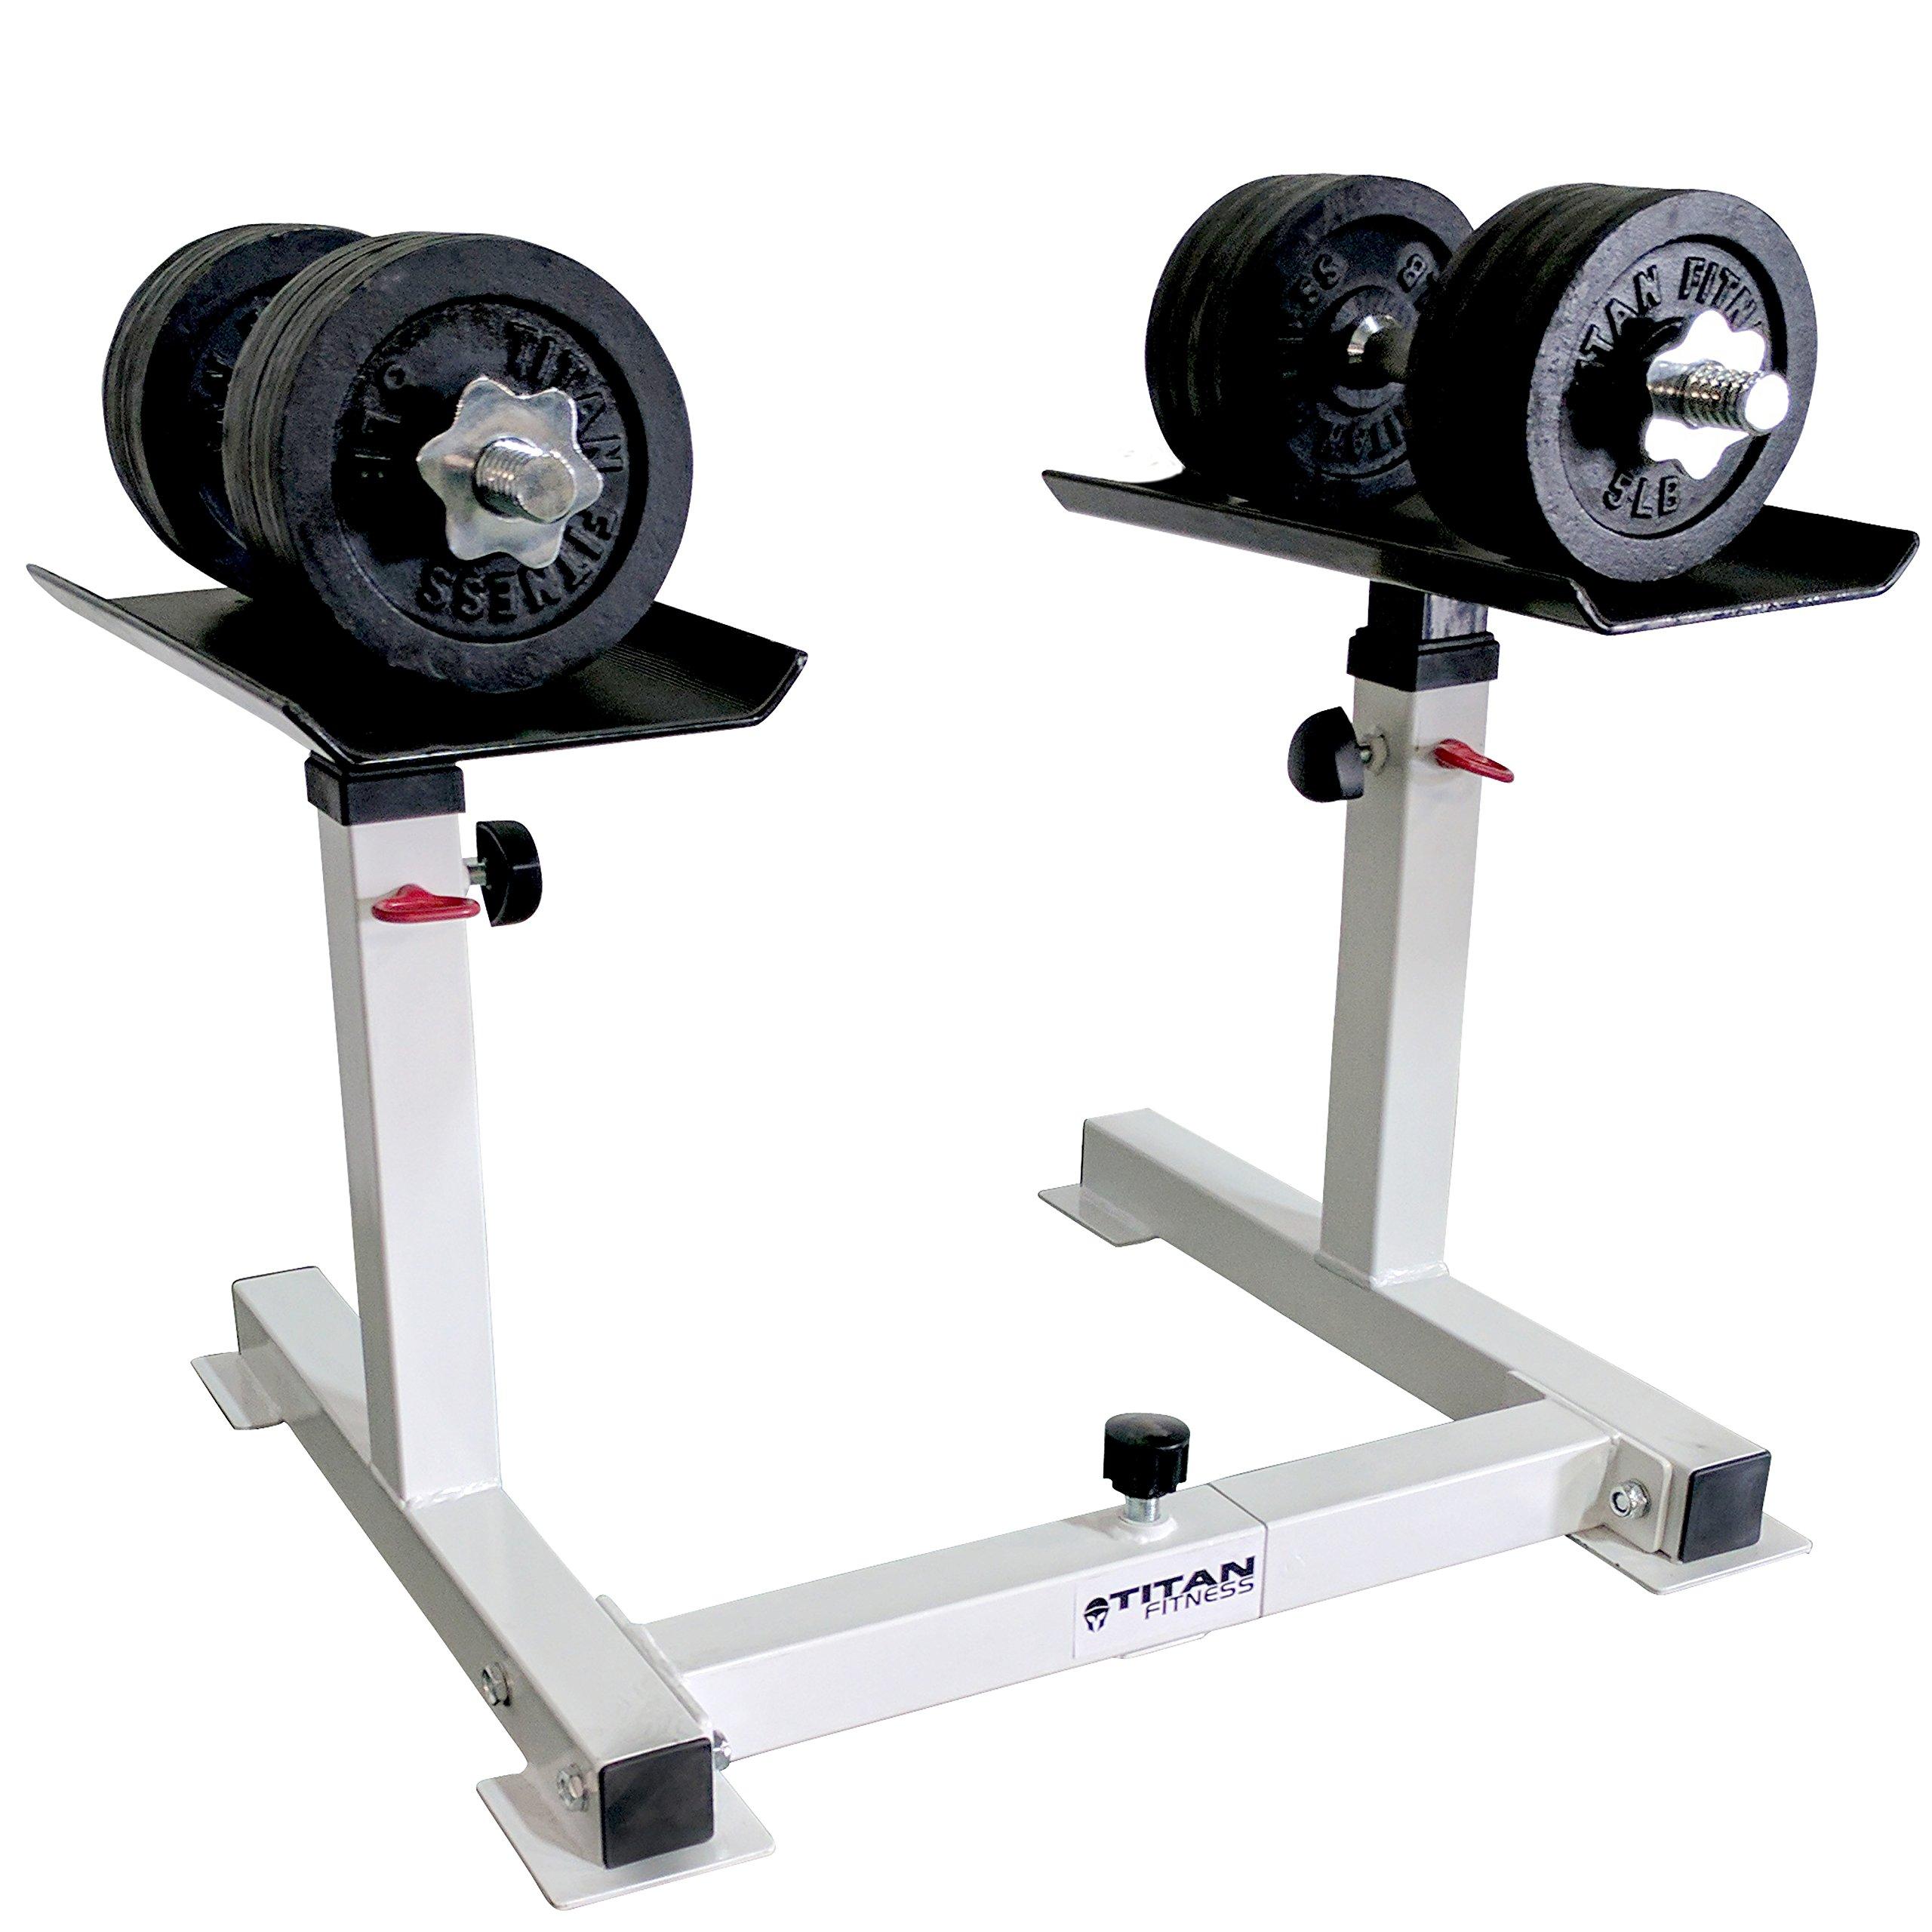 Titan Adjustable Height Dumbbell Holder by Titan Fitness (Image #4)